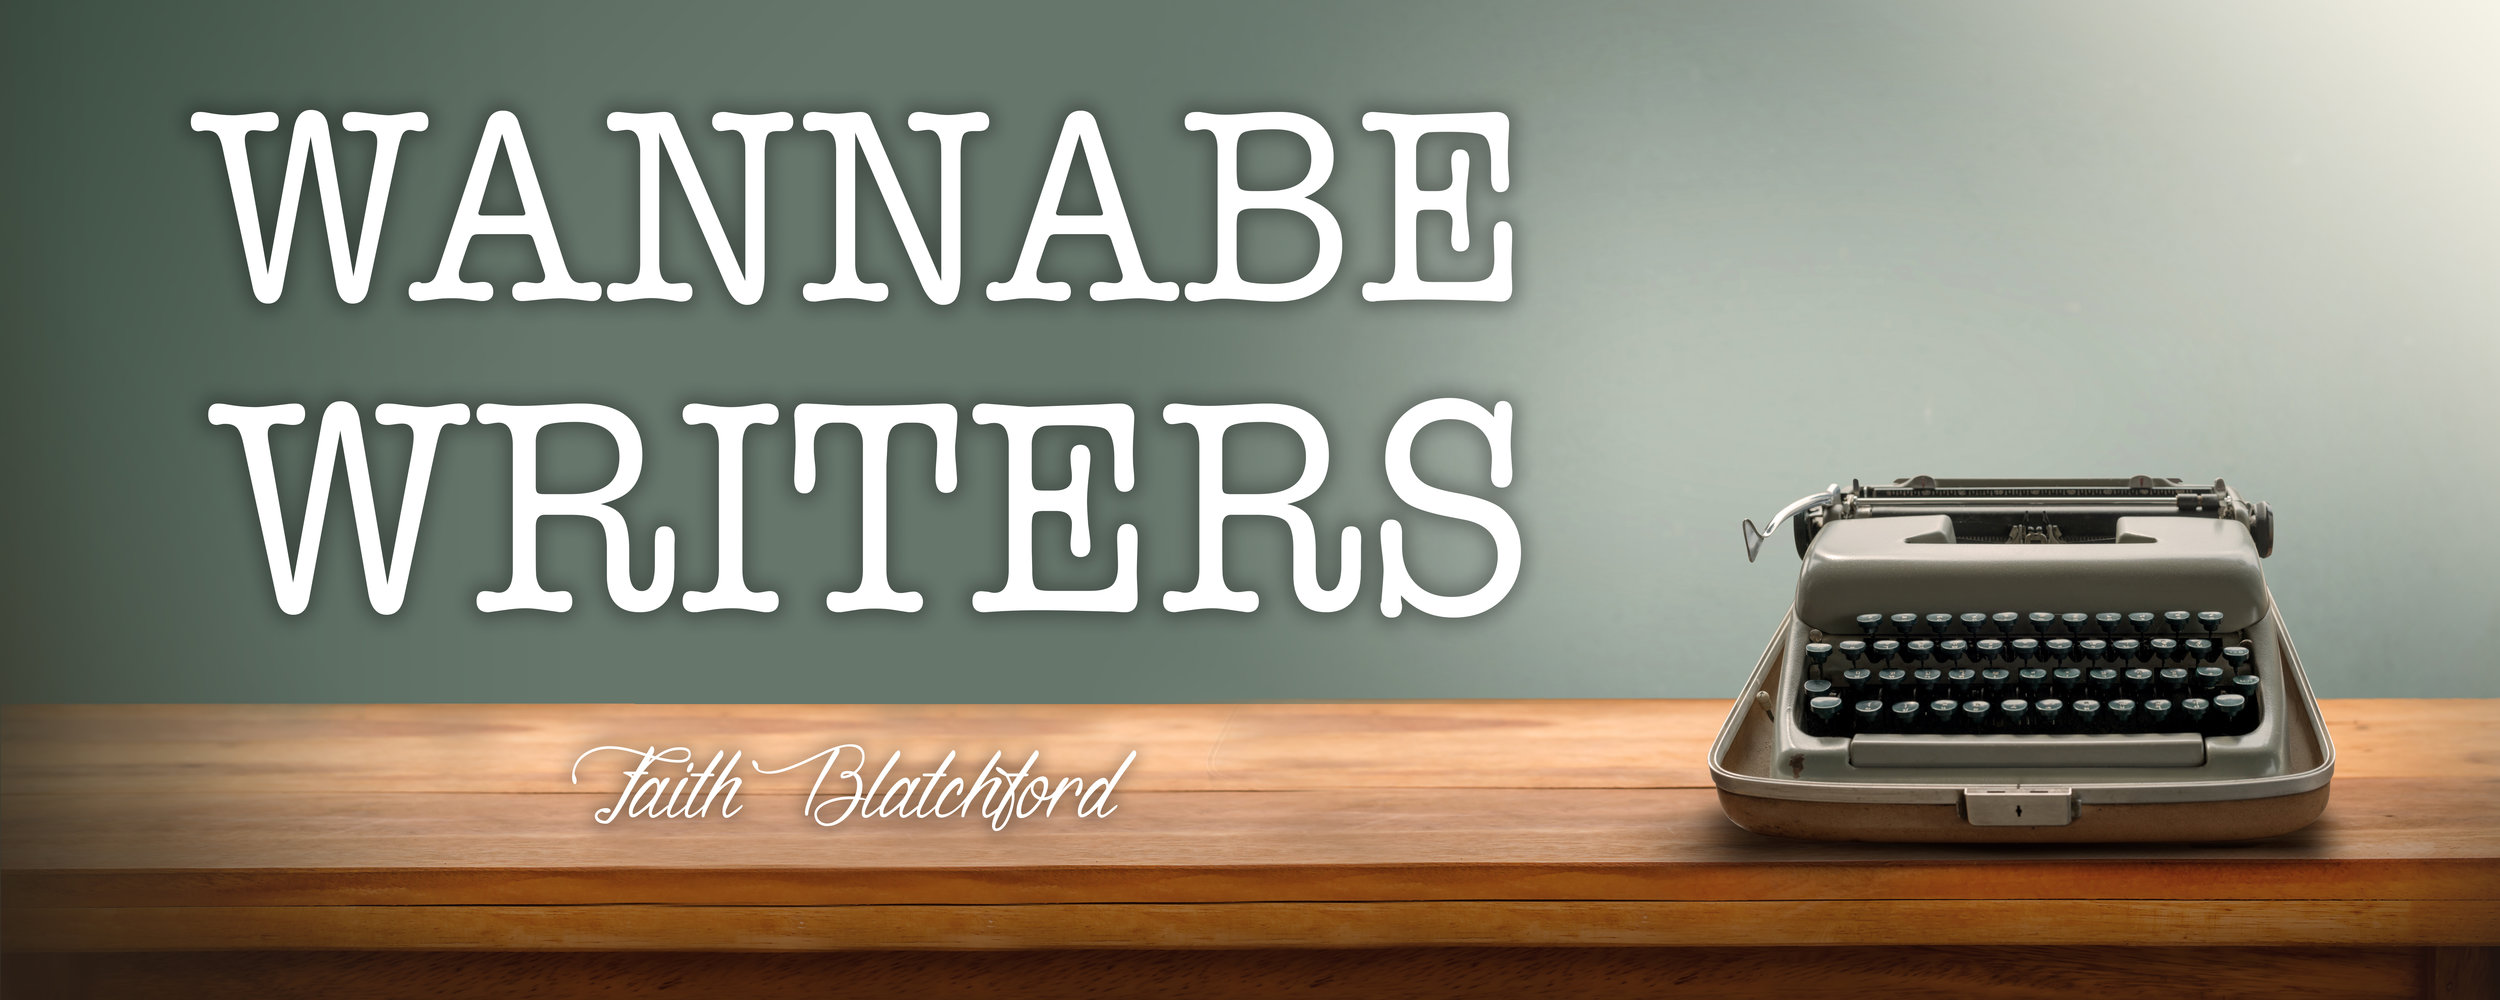 Wannabe Writers seminar with Faith Blatchford